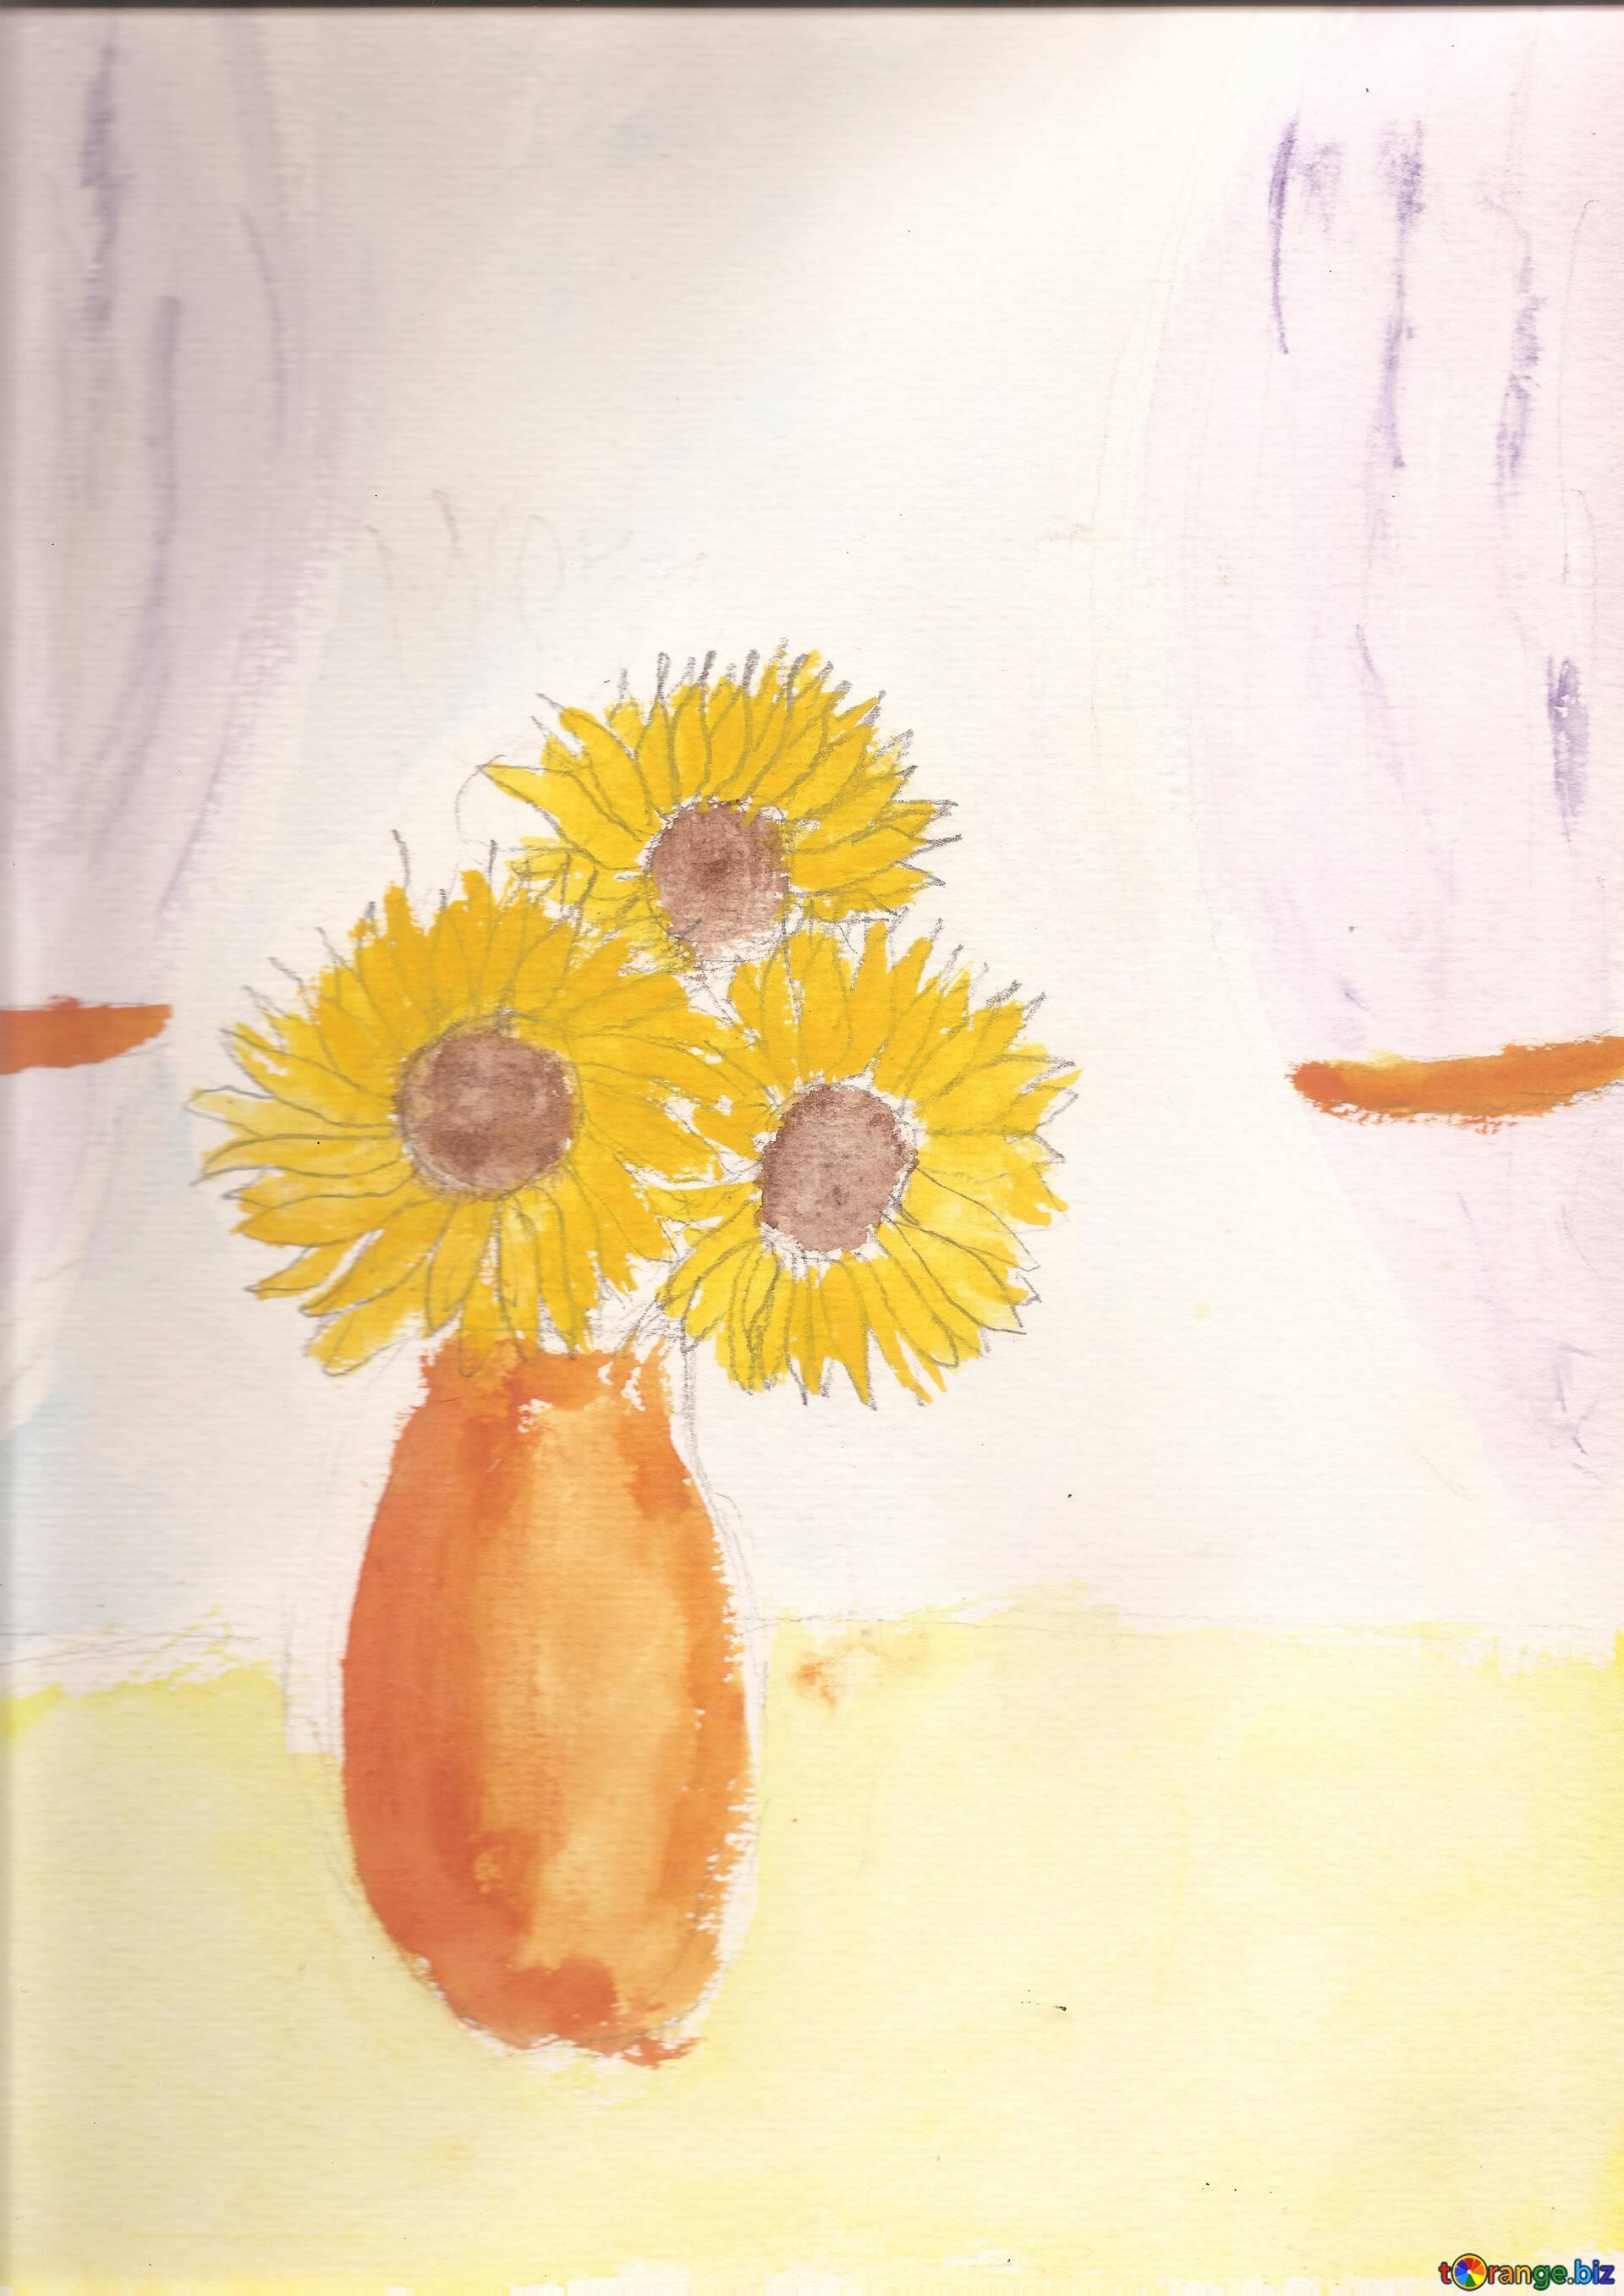 Children's drawing sunflowers